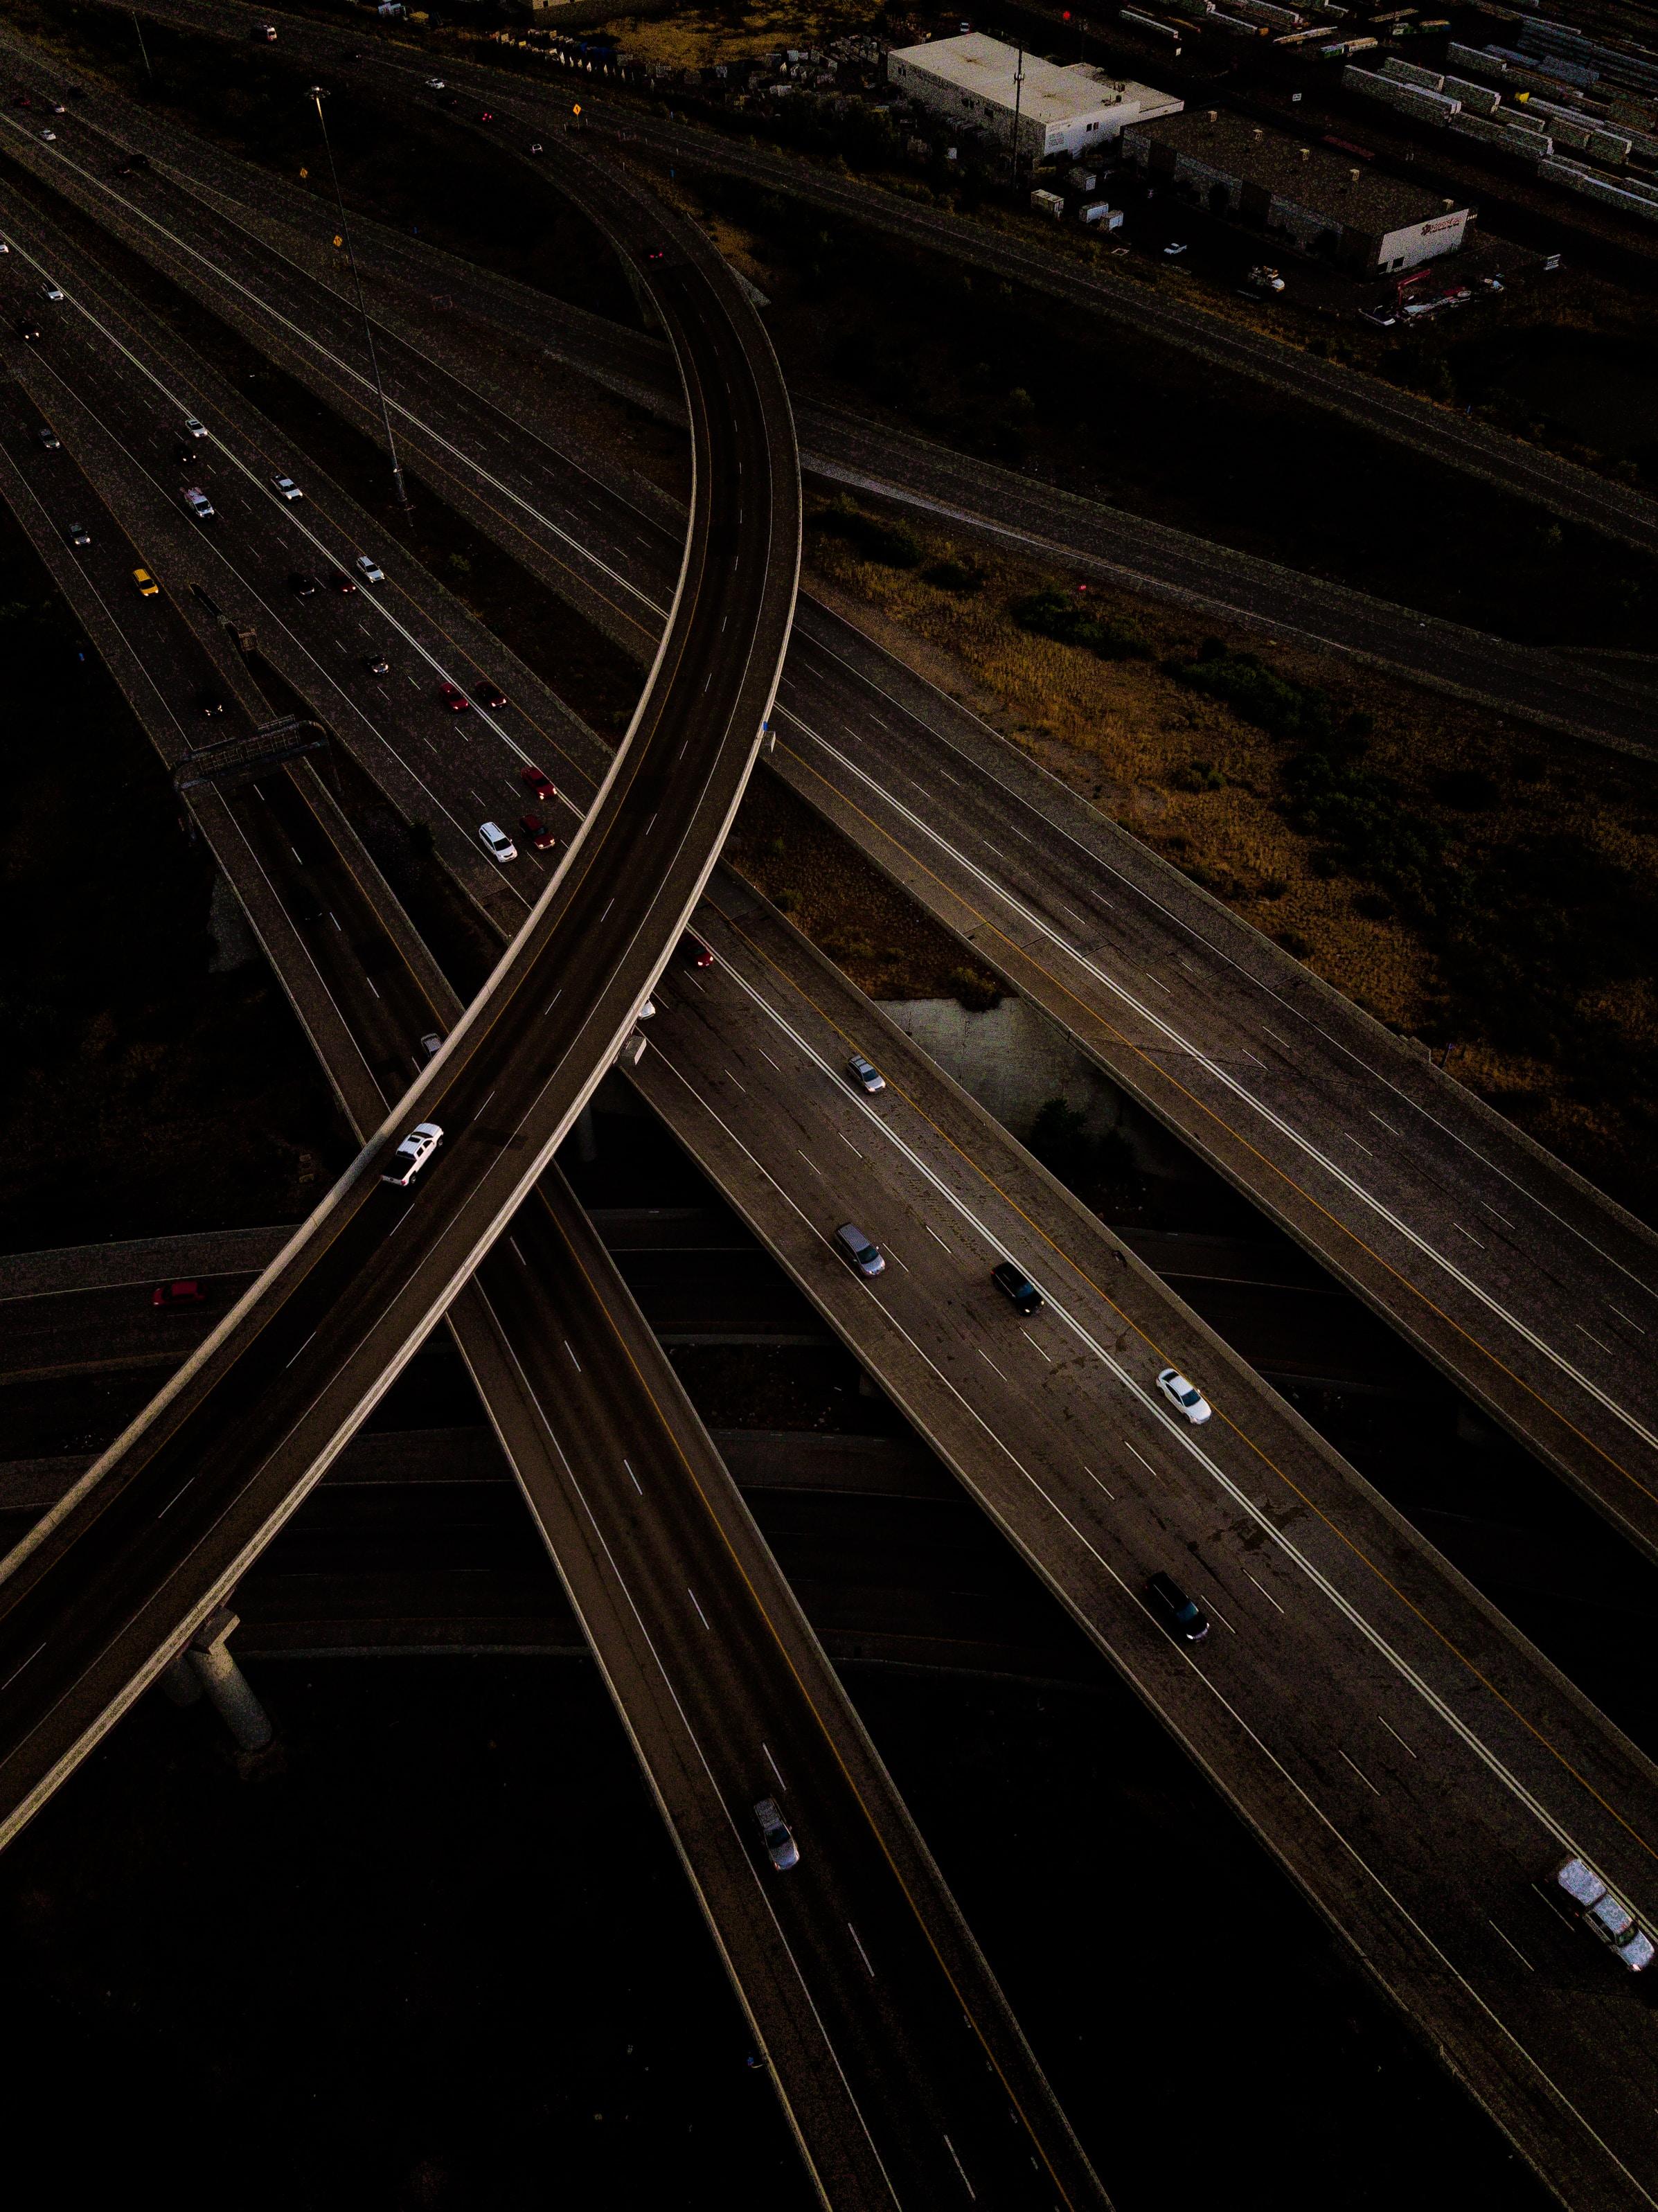 bird's-eye view of roadways